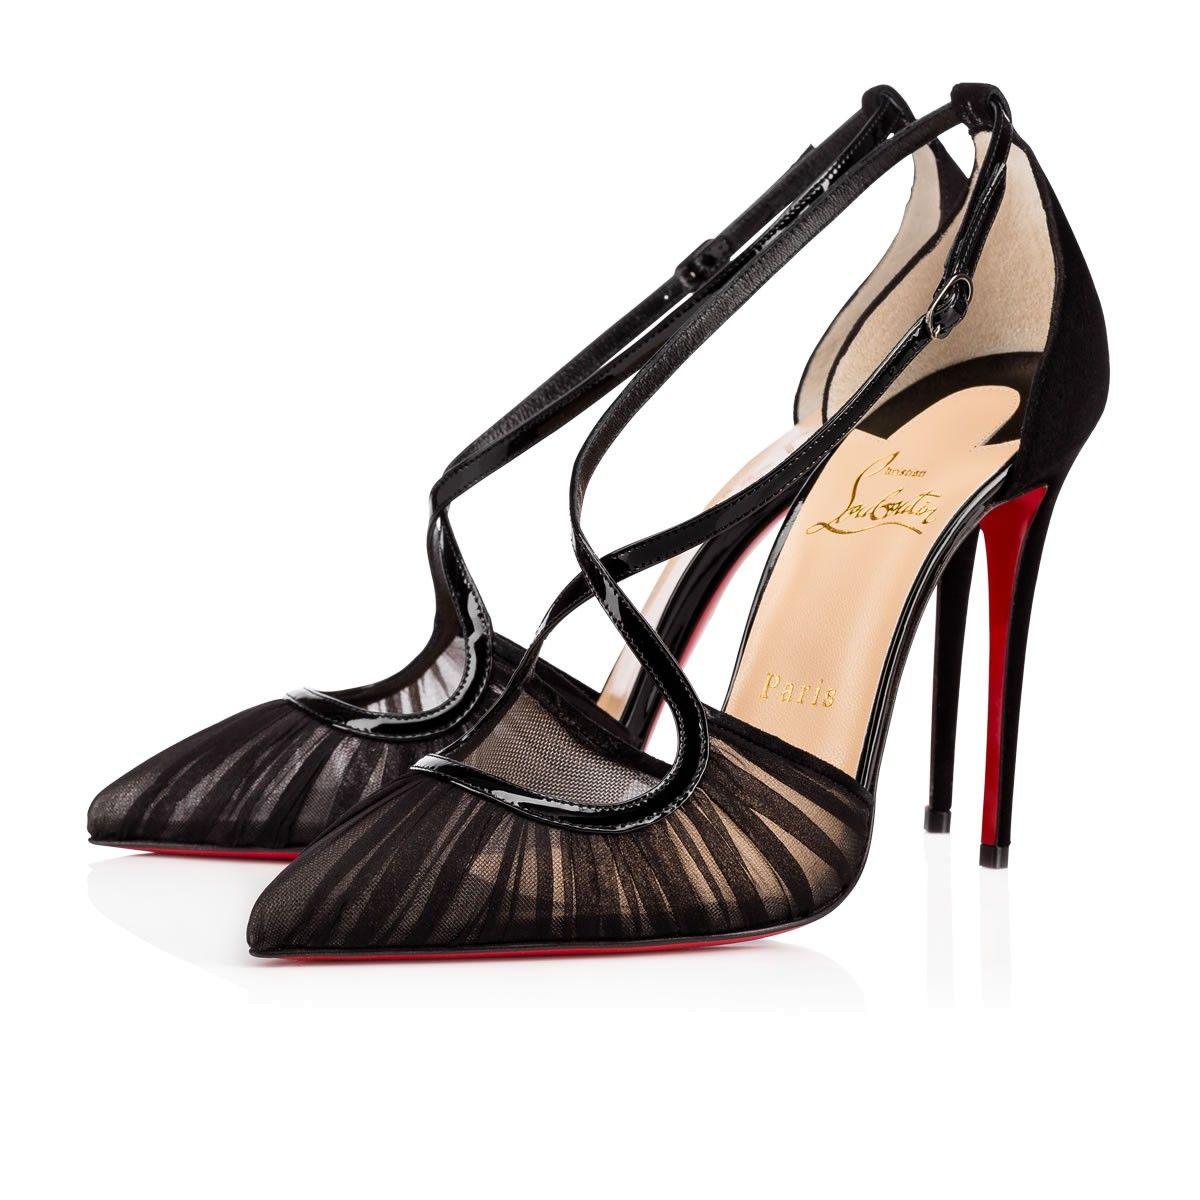 30fed927ac88 CHRISTIAN LOUBOUTIN Marchella Mousseline Veau Velours 100 Black Silk  Chiffon - Women Shoes - Christian Louboutin.  christianlouboutin  shoes